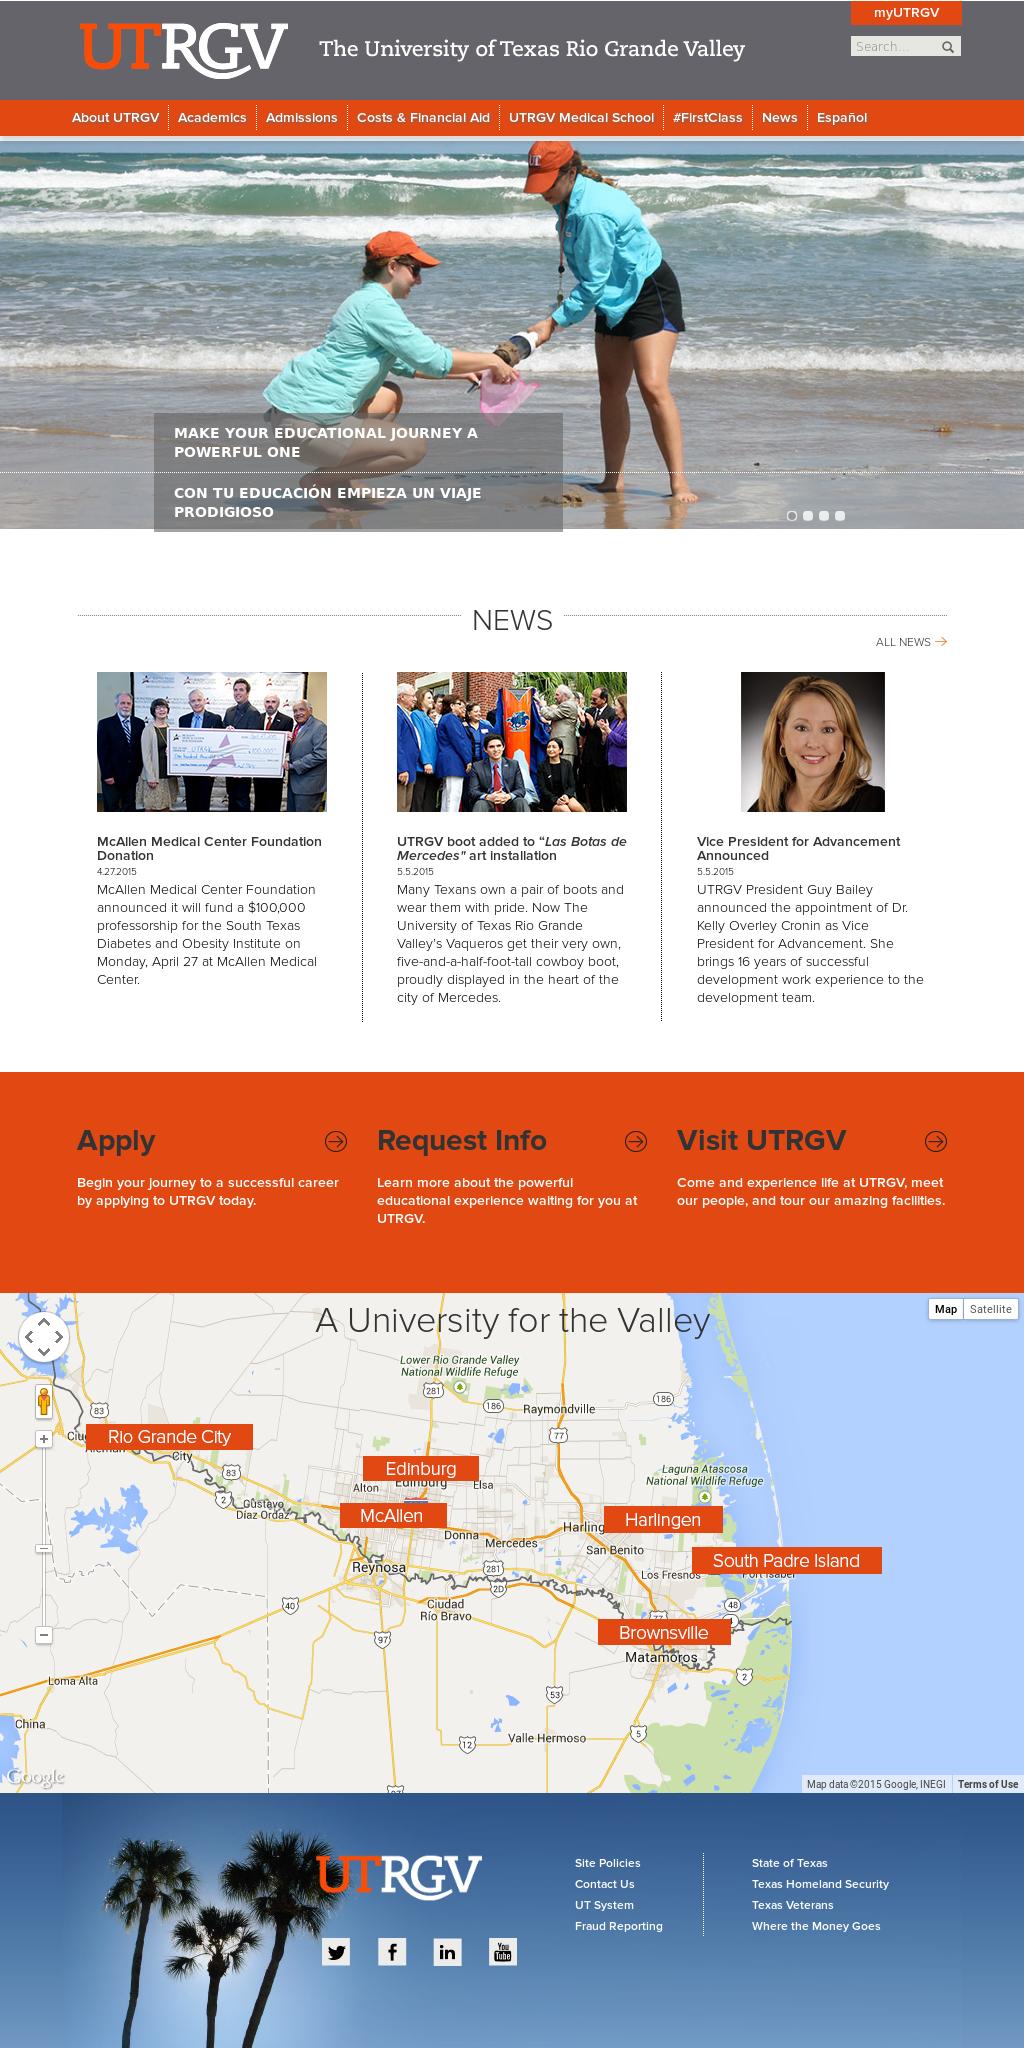 UTRGV Competitors, Revenue and Employees - Owler Company Profile